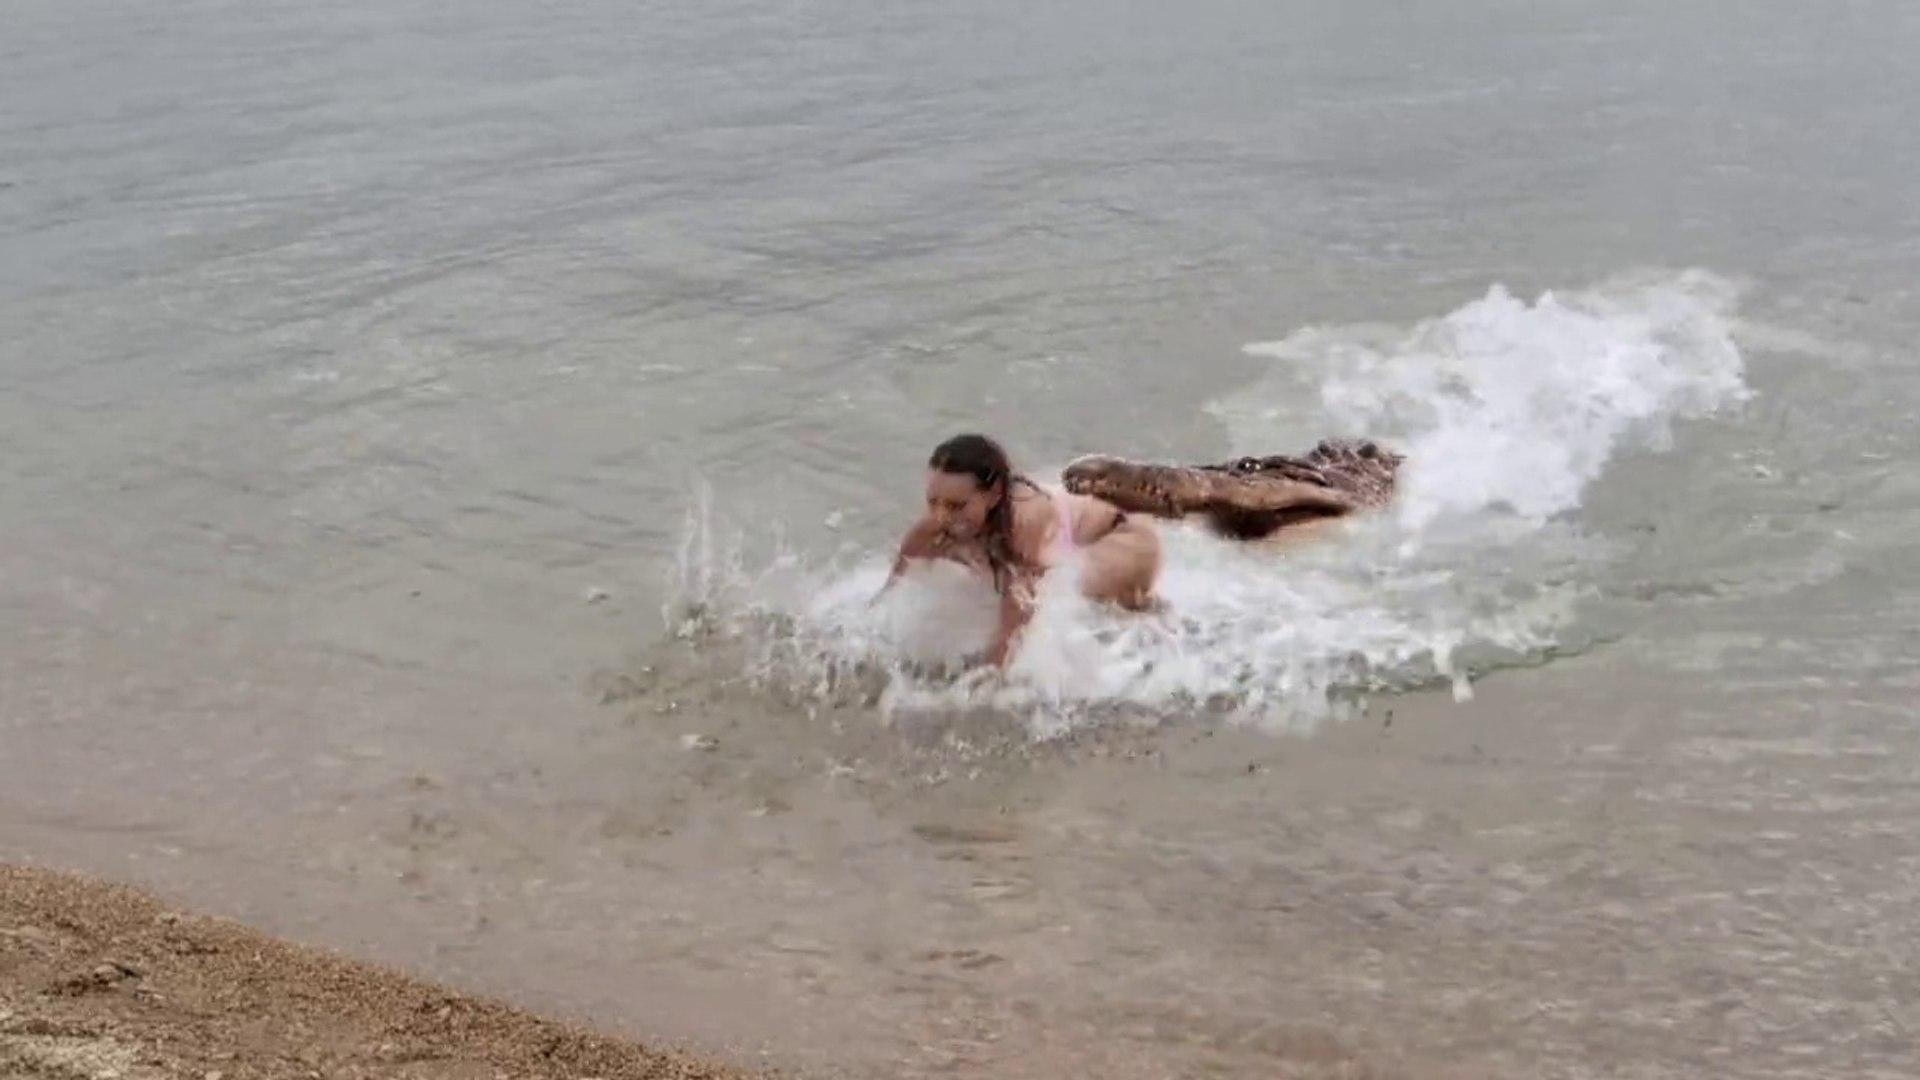 Anaconda Vs Lake Placid Full Movie lake placid vs anaconda - exclusive trailer